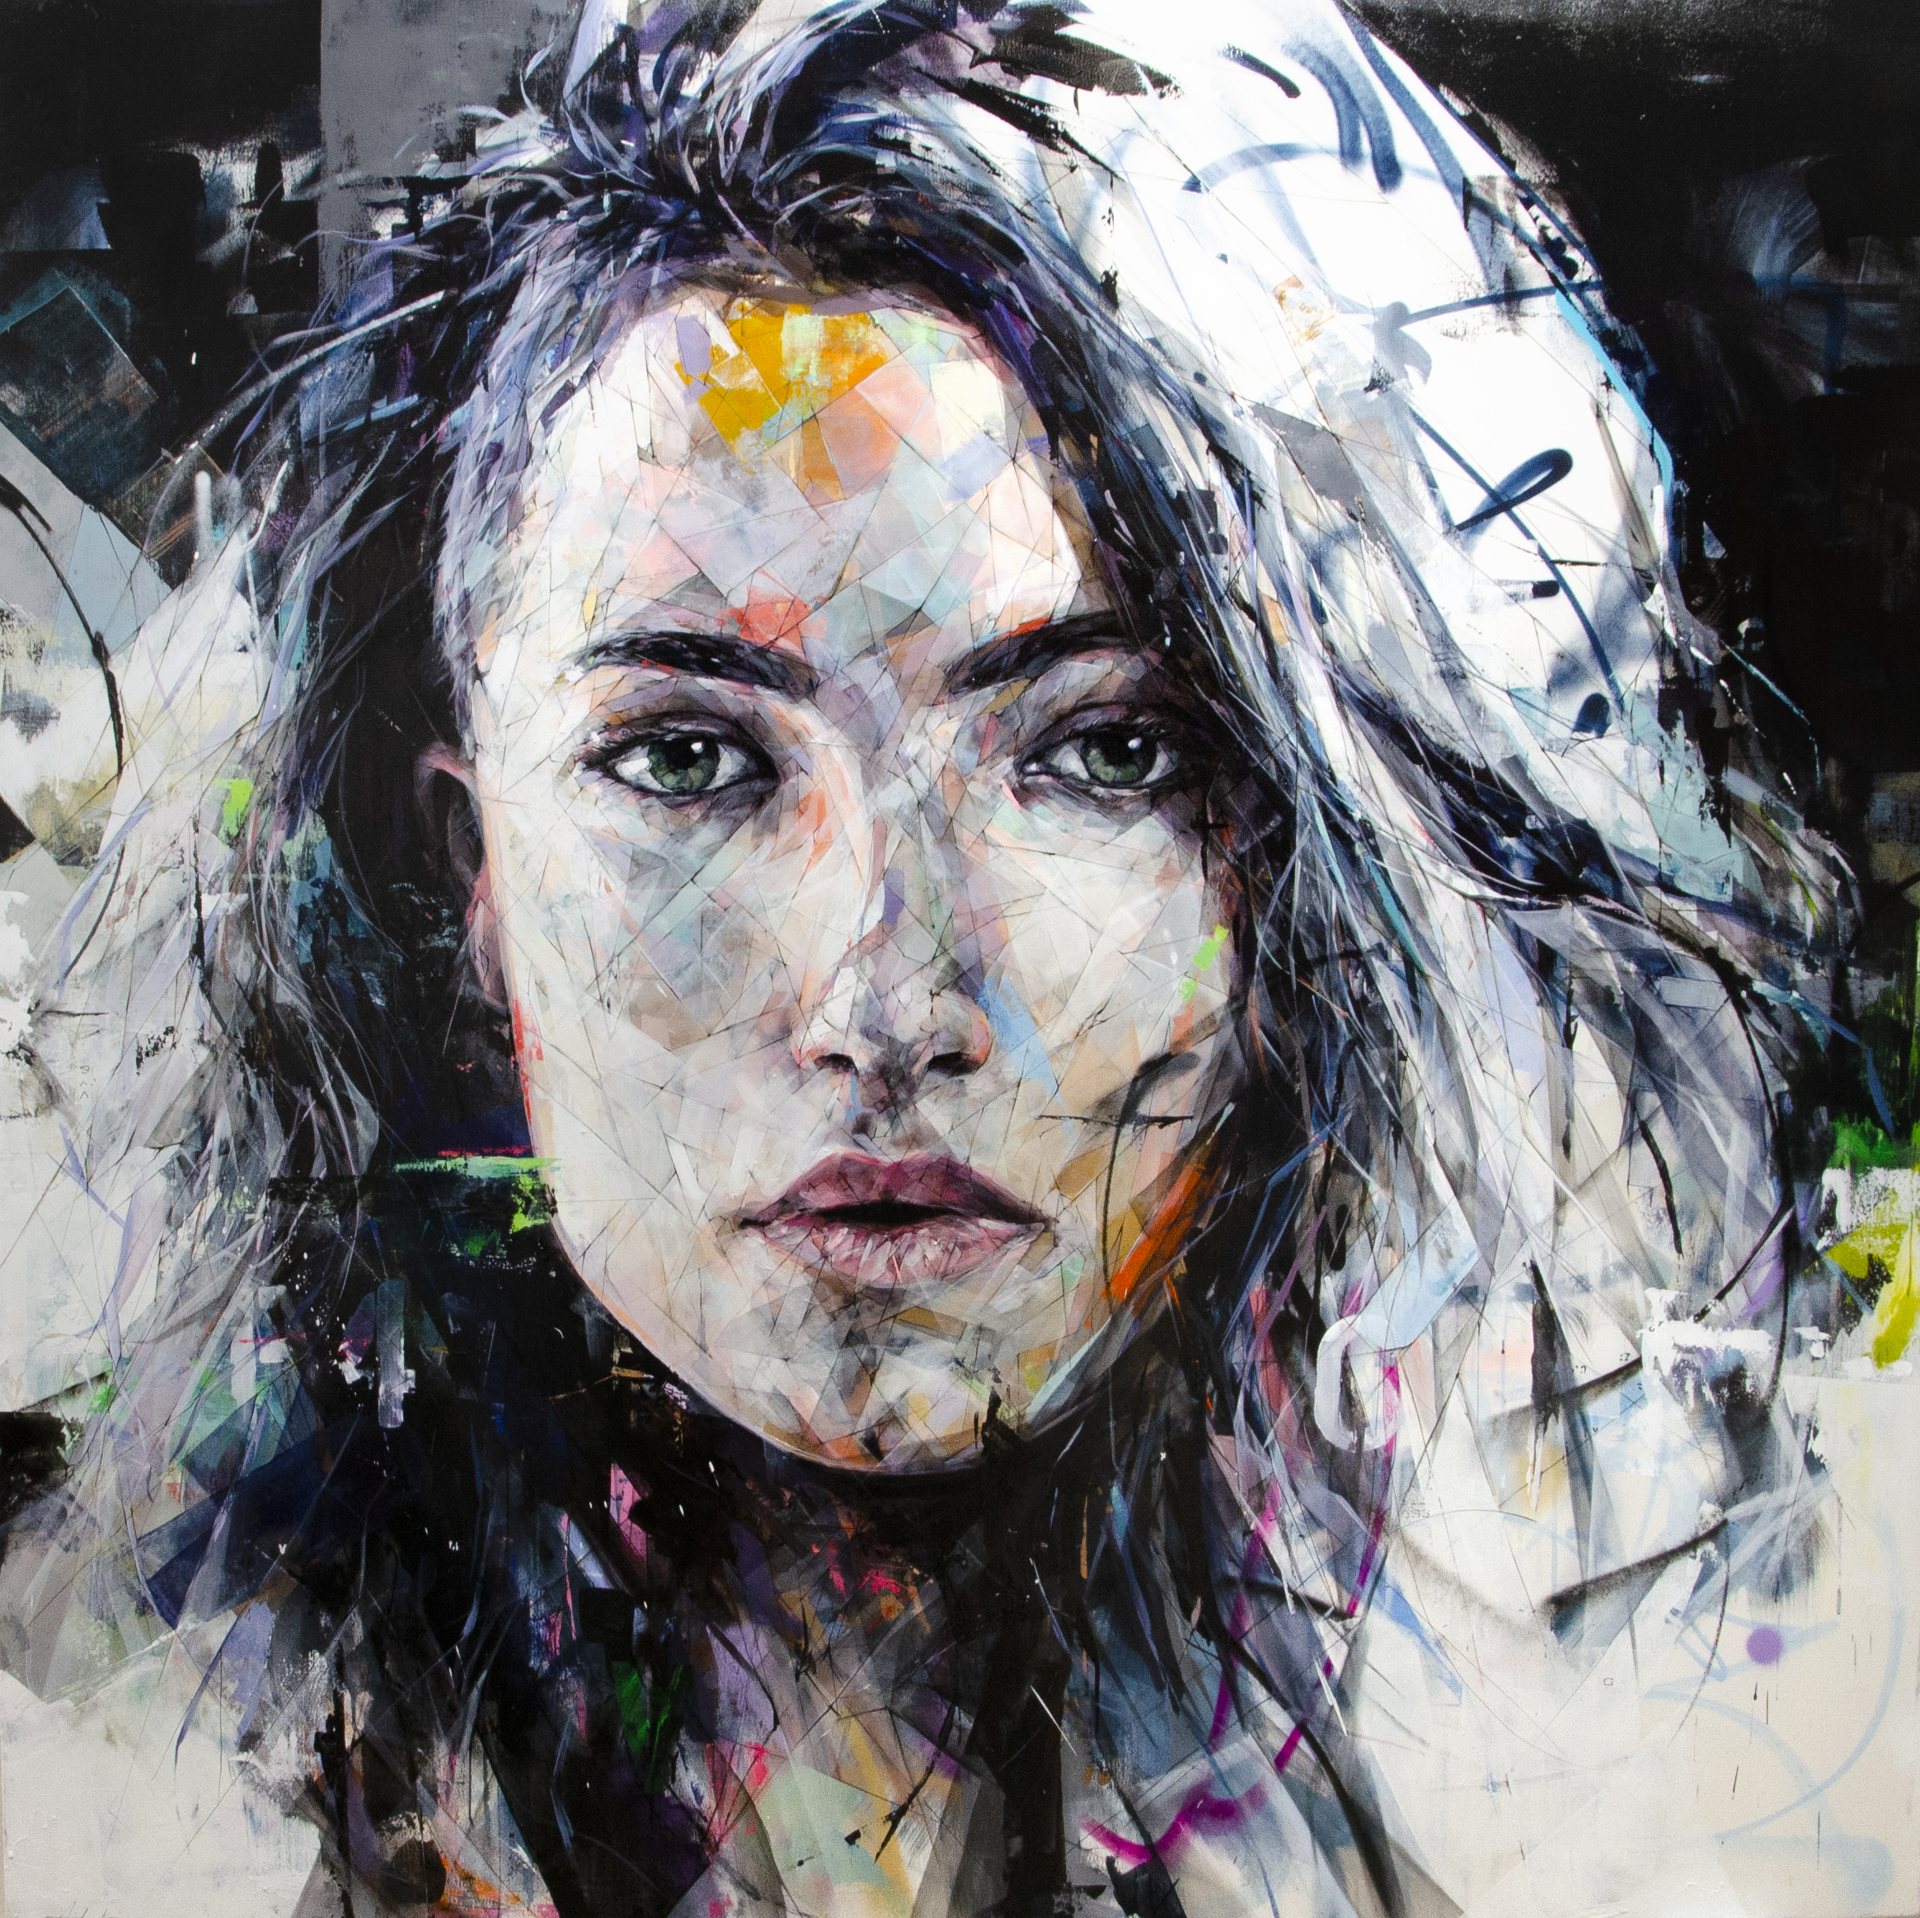 Kaleidoscope by Aiden Kringen